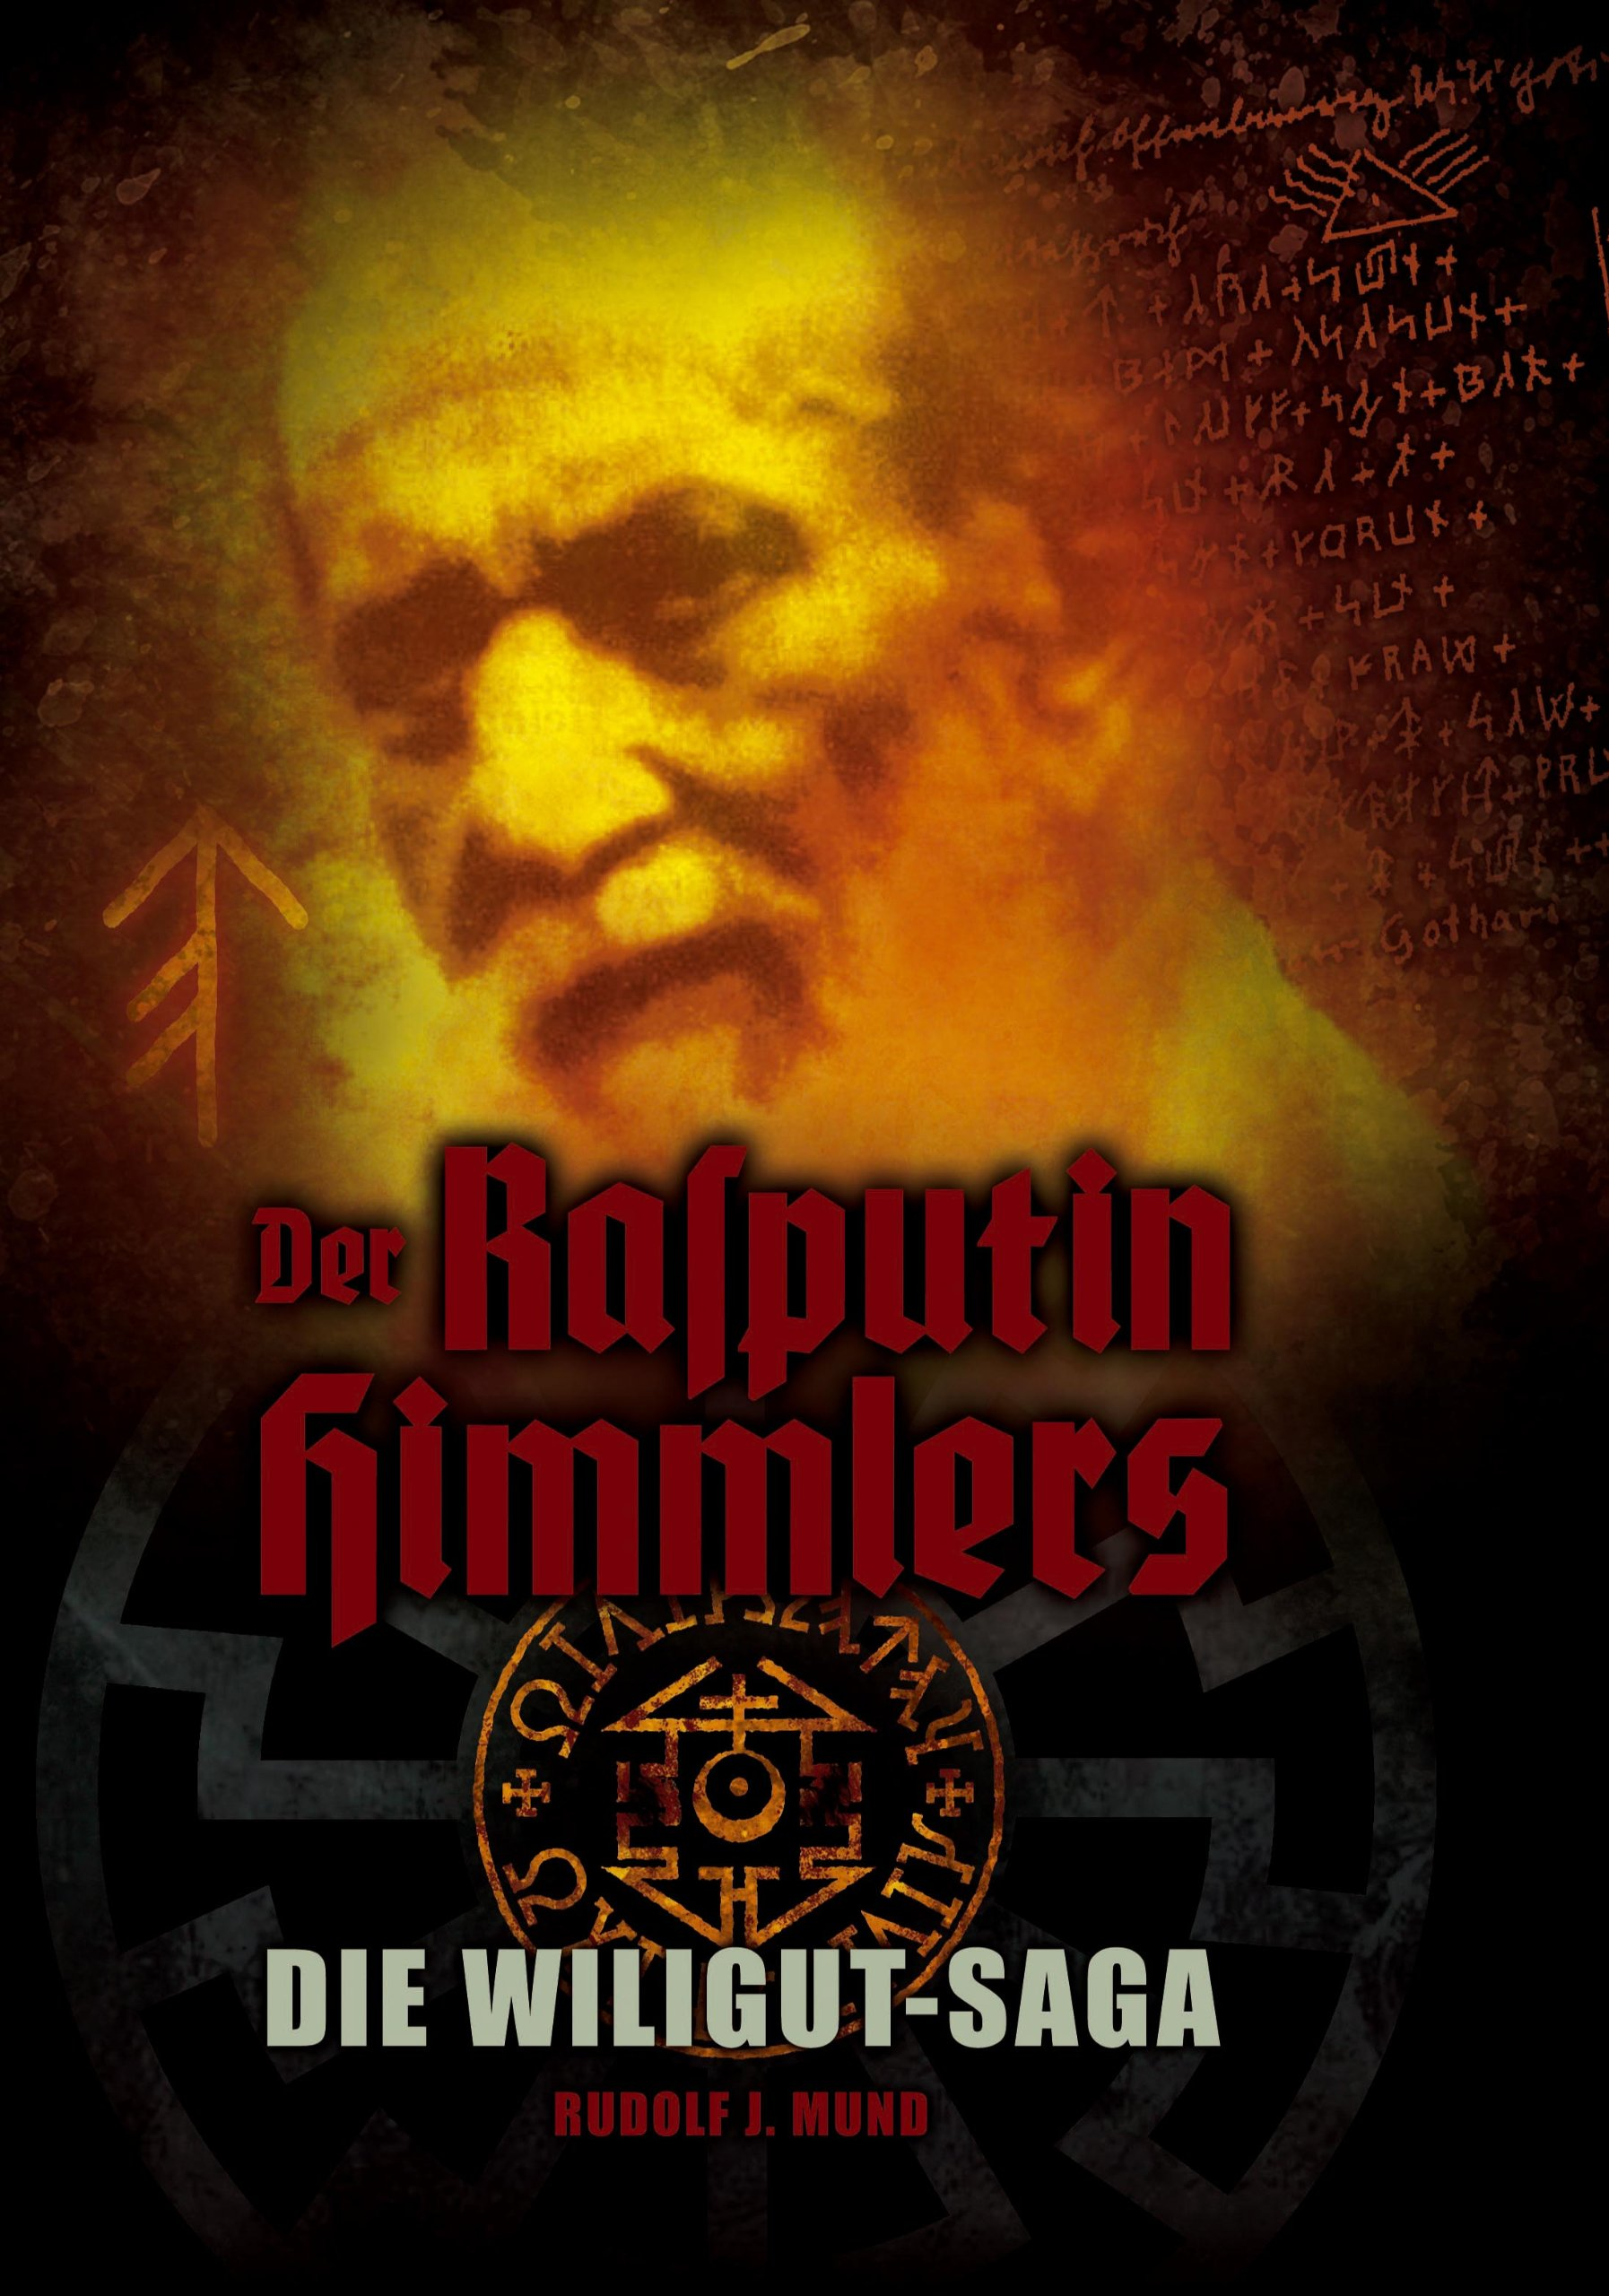 Der Rasputin Himmlers. Die Wiligut-Saga